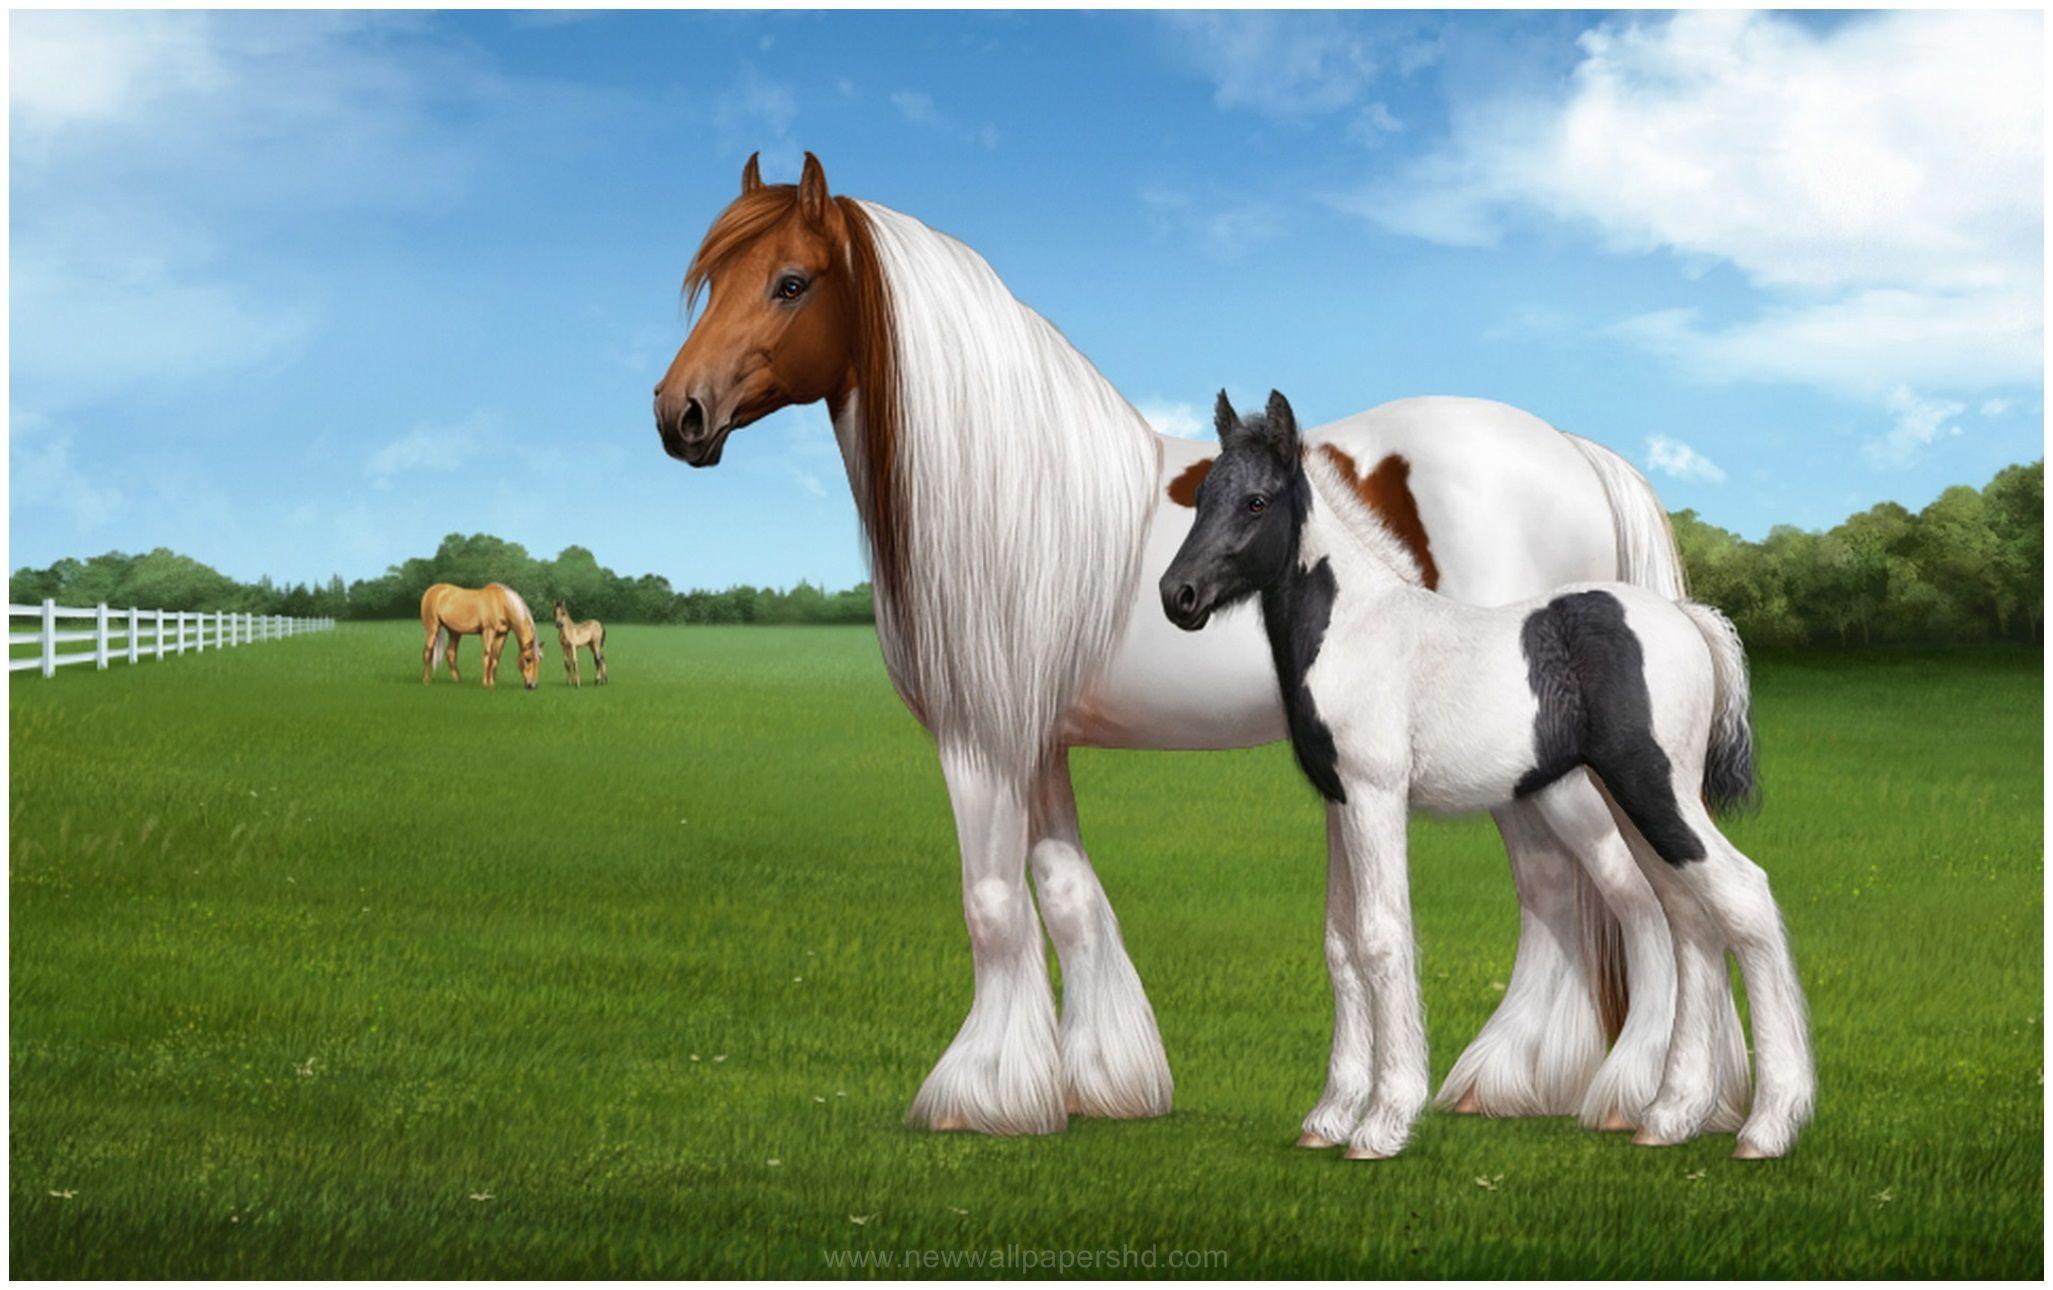 Hd wallpaper horse - Gypsy Horse Hd Wallpaper Wallpapers Pinterest Gypsy Horse And Hd Wallpaper